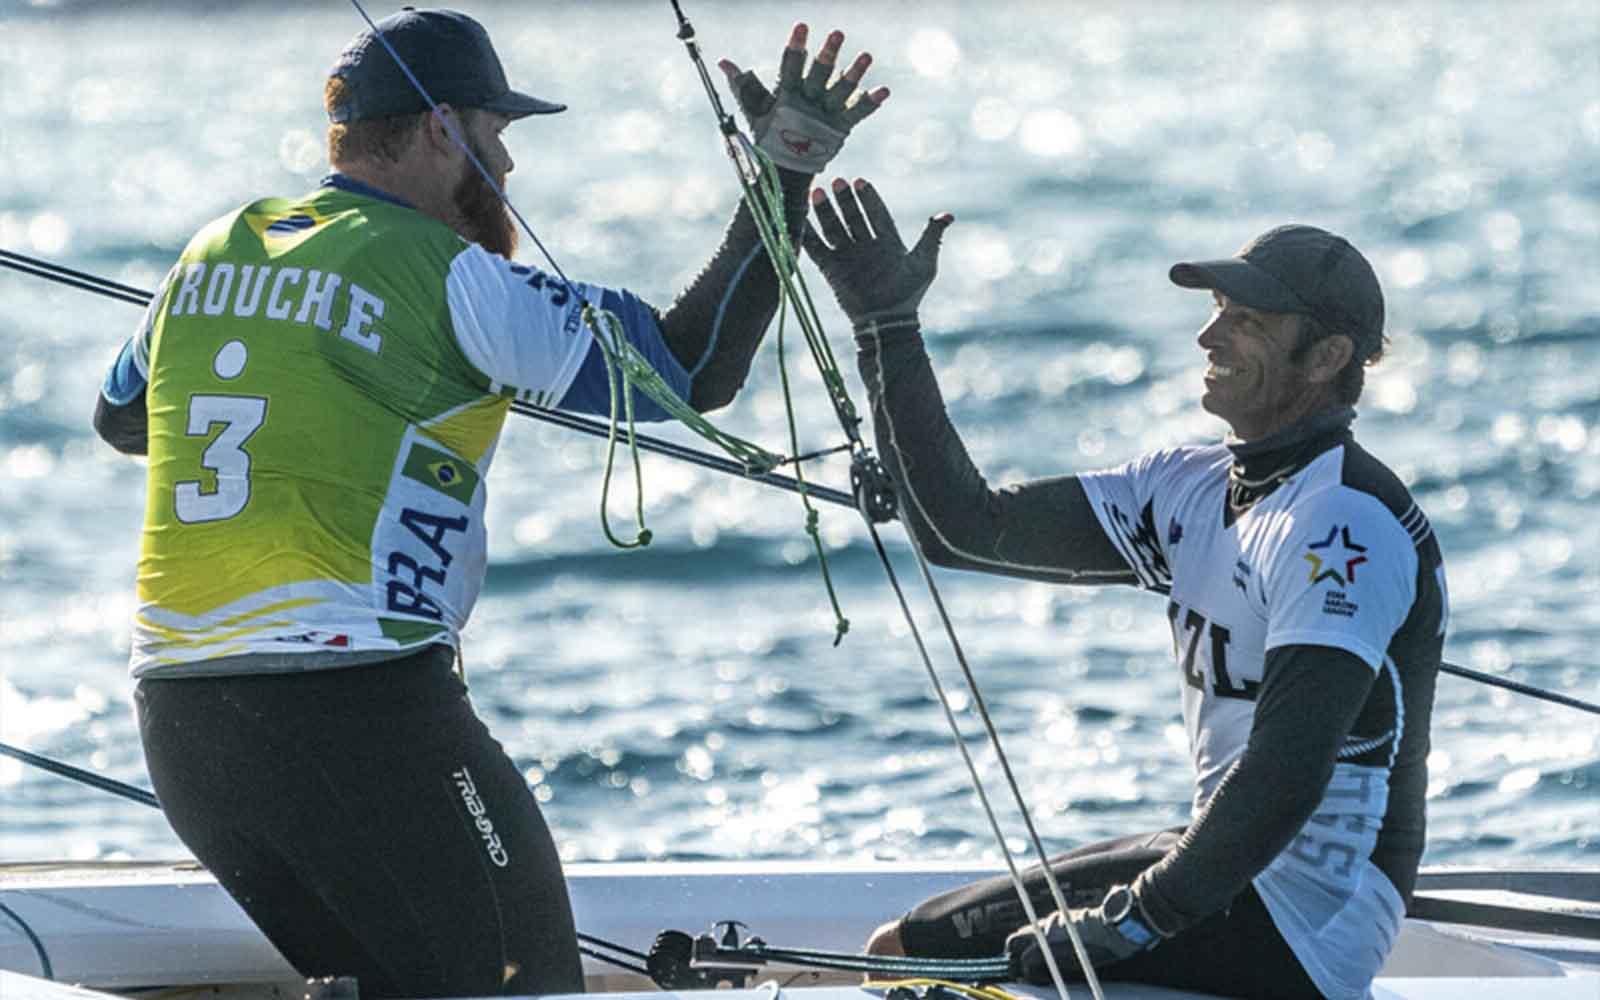 Vitória de Trouche e Pepper (Gilles Morelle SSL) - boat shopping